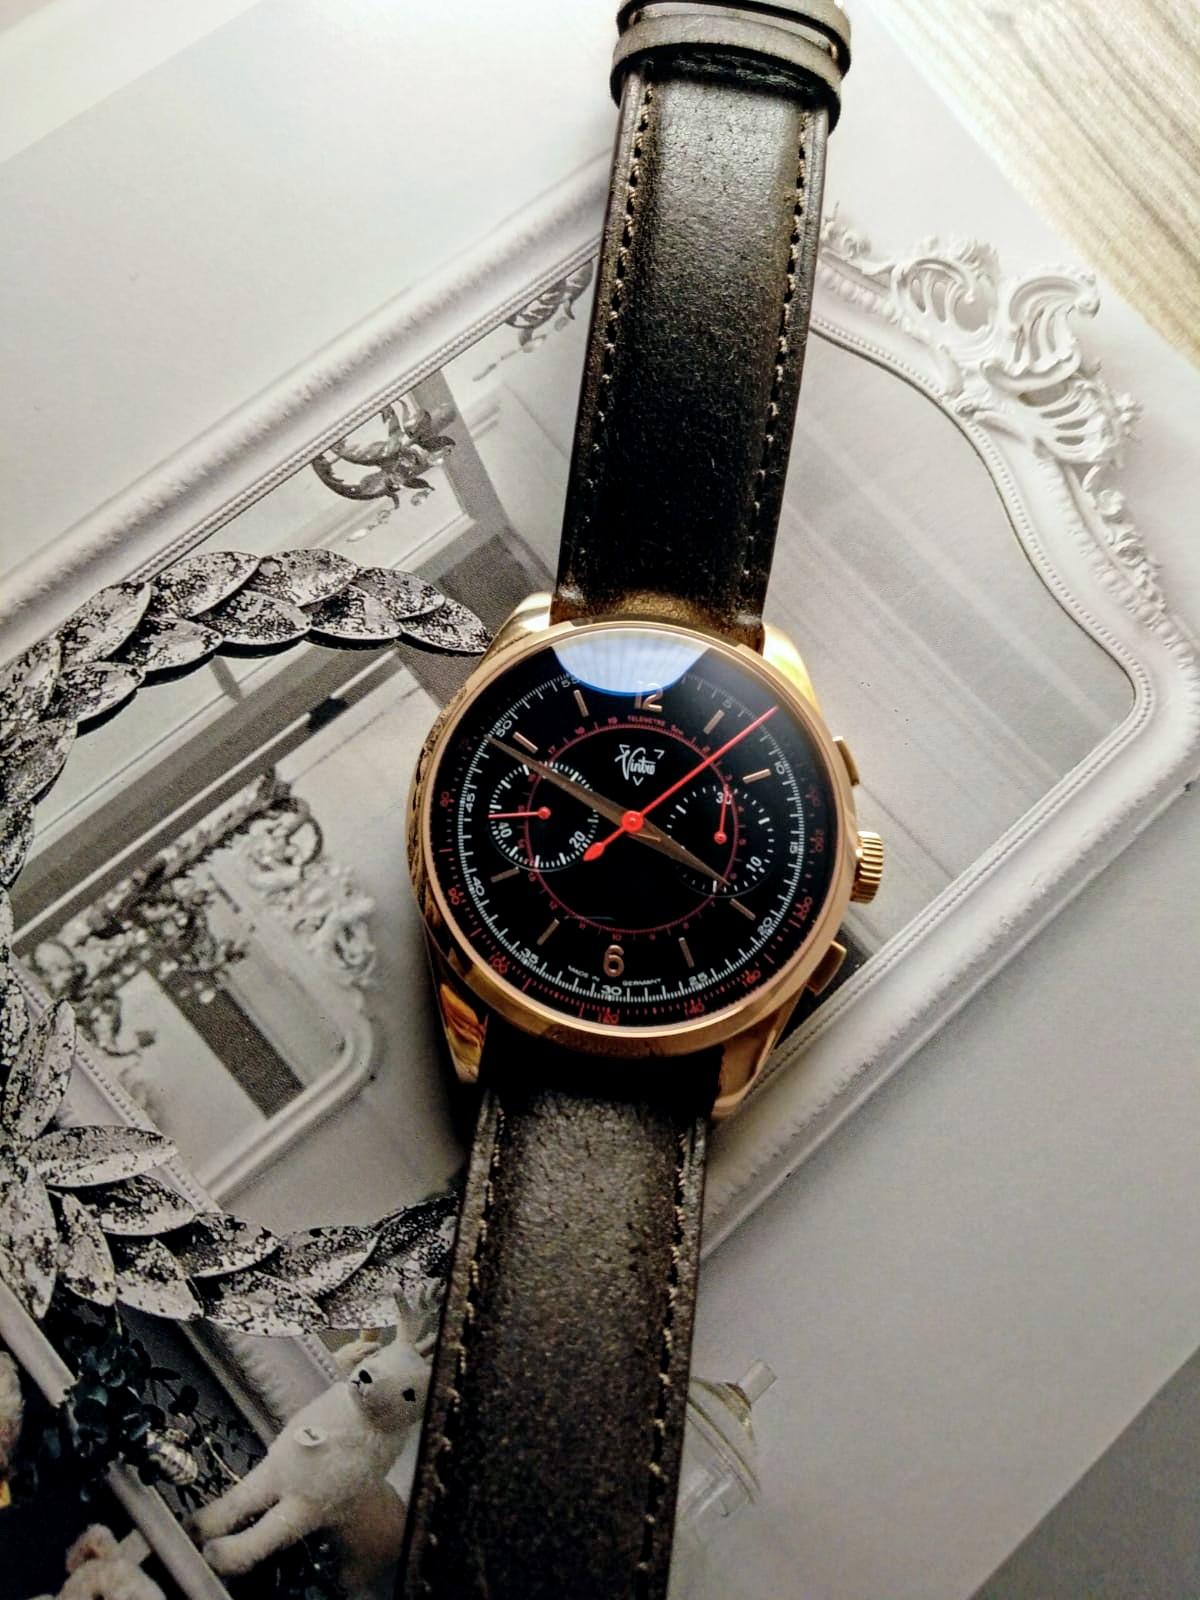 Rose Gold Le Mans 1952 Chronograph